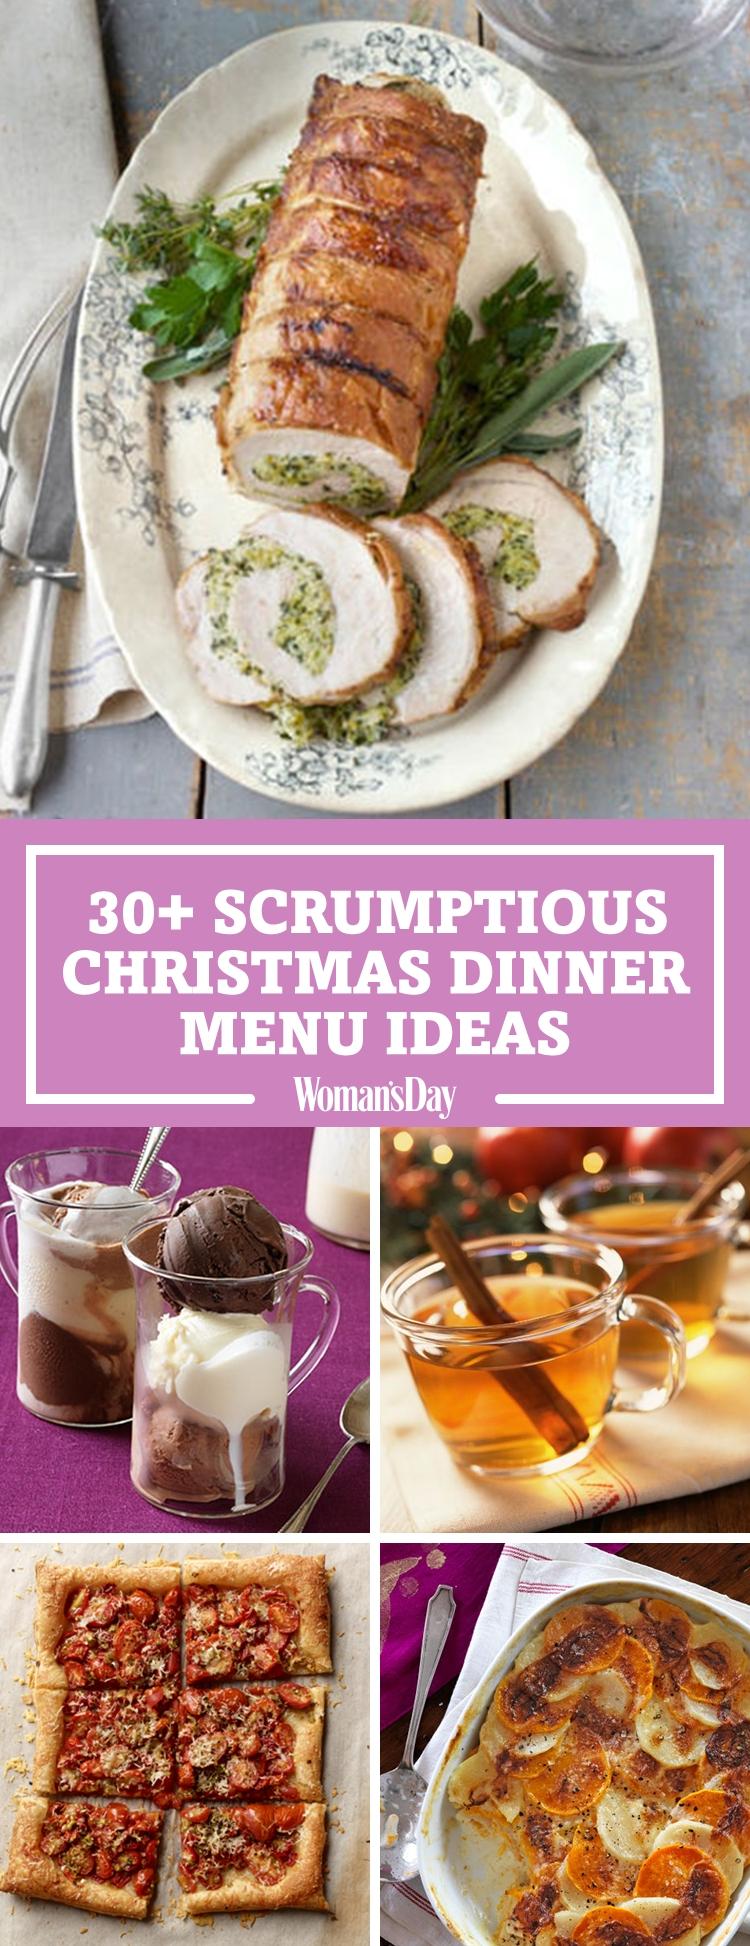 10 Cute Traditional Christmas Dinner Menu Ideas best christmas dinner menu ideas for 2017 2021